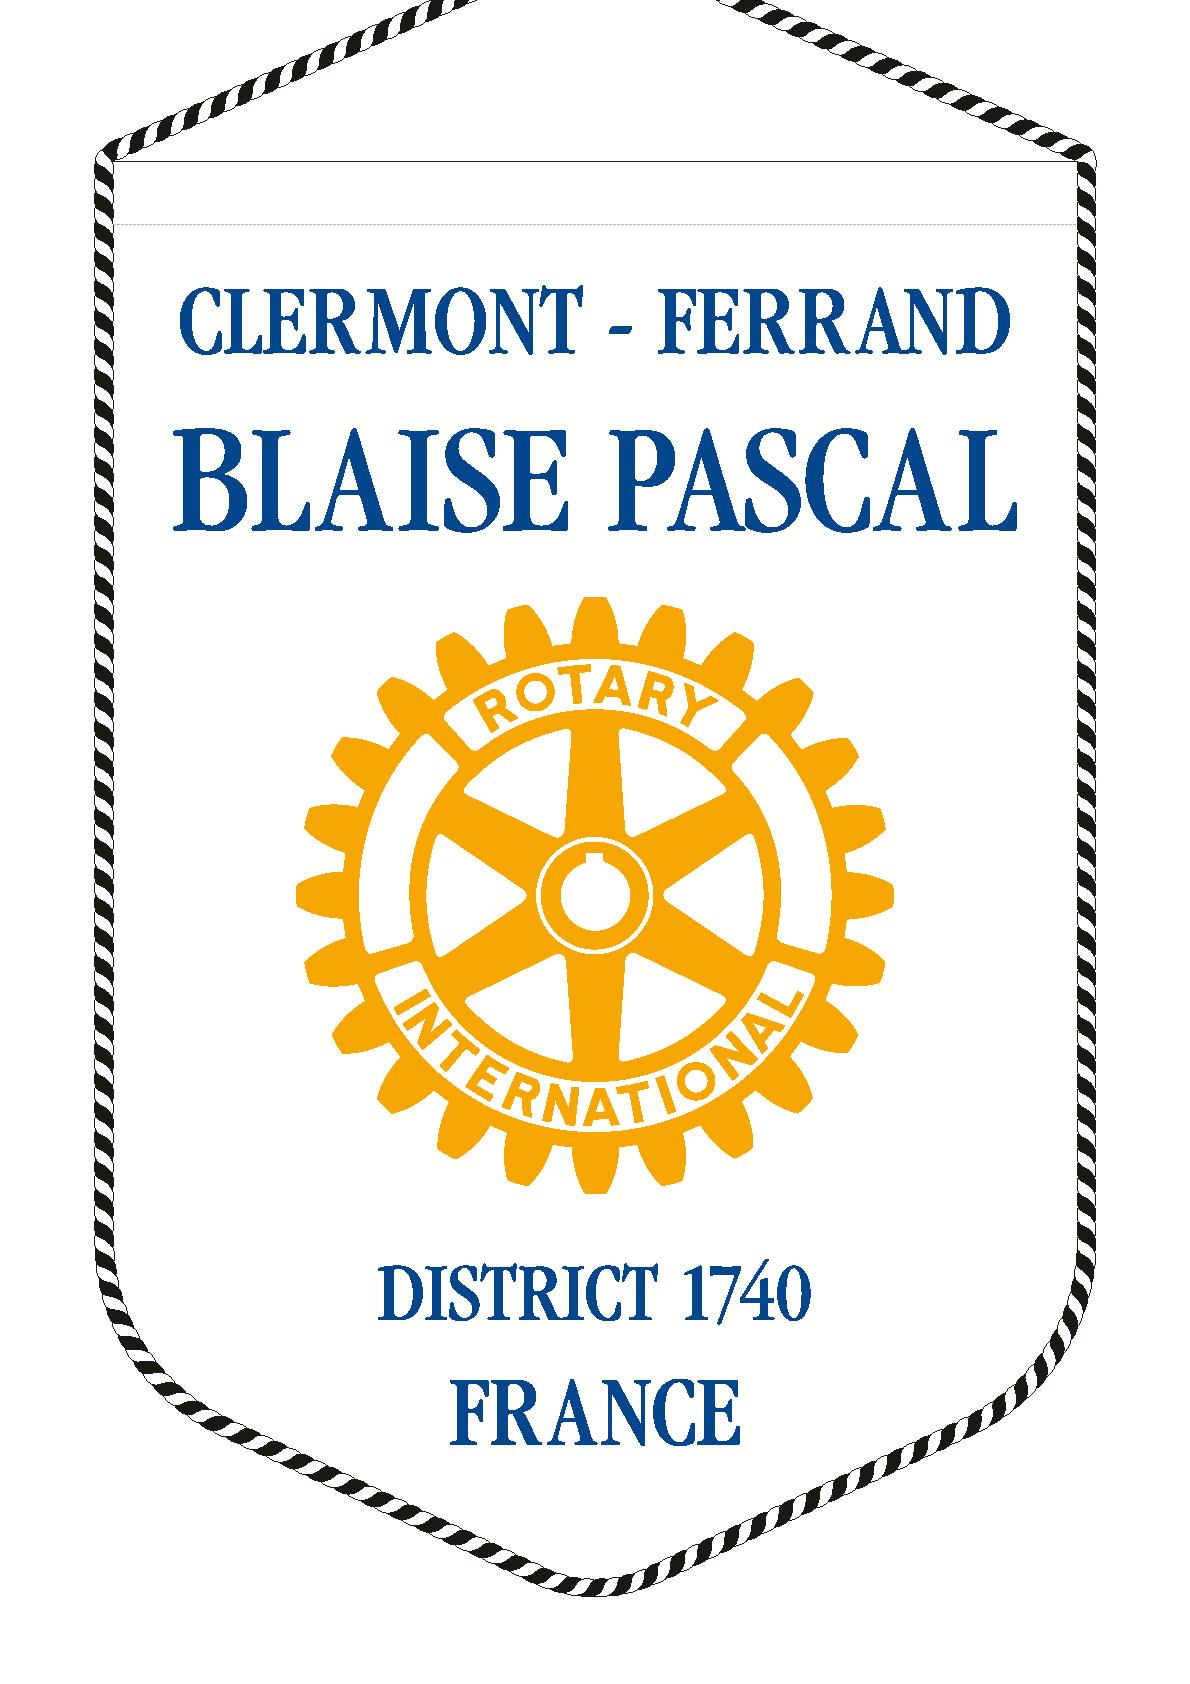 FANION ROTARY CLUB CLERMONT FERRAND BLAISE PASCAL V